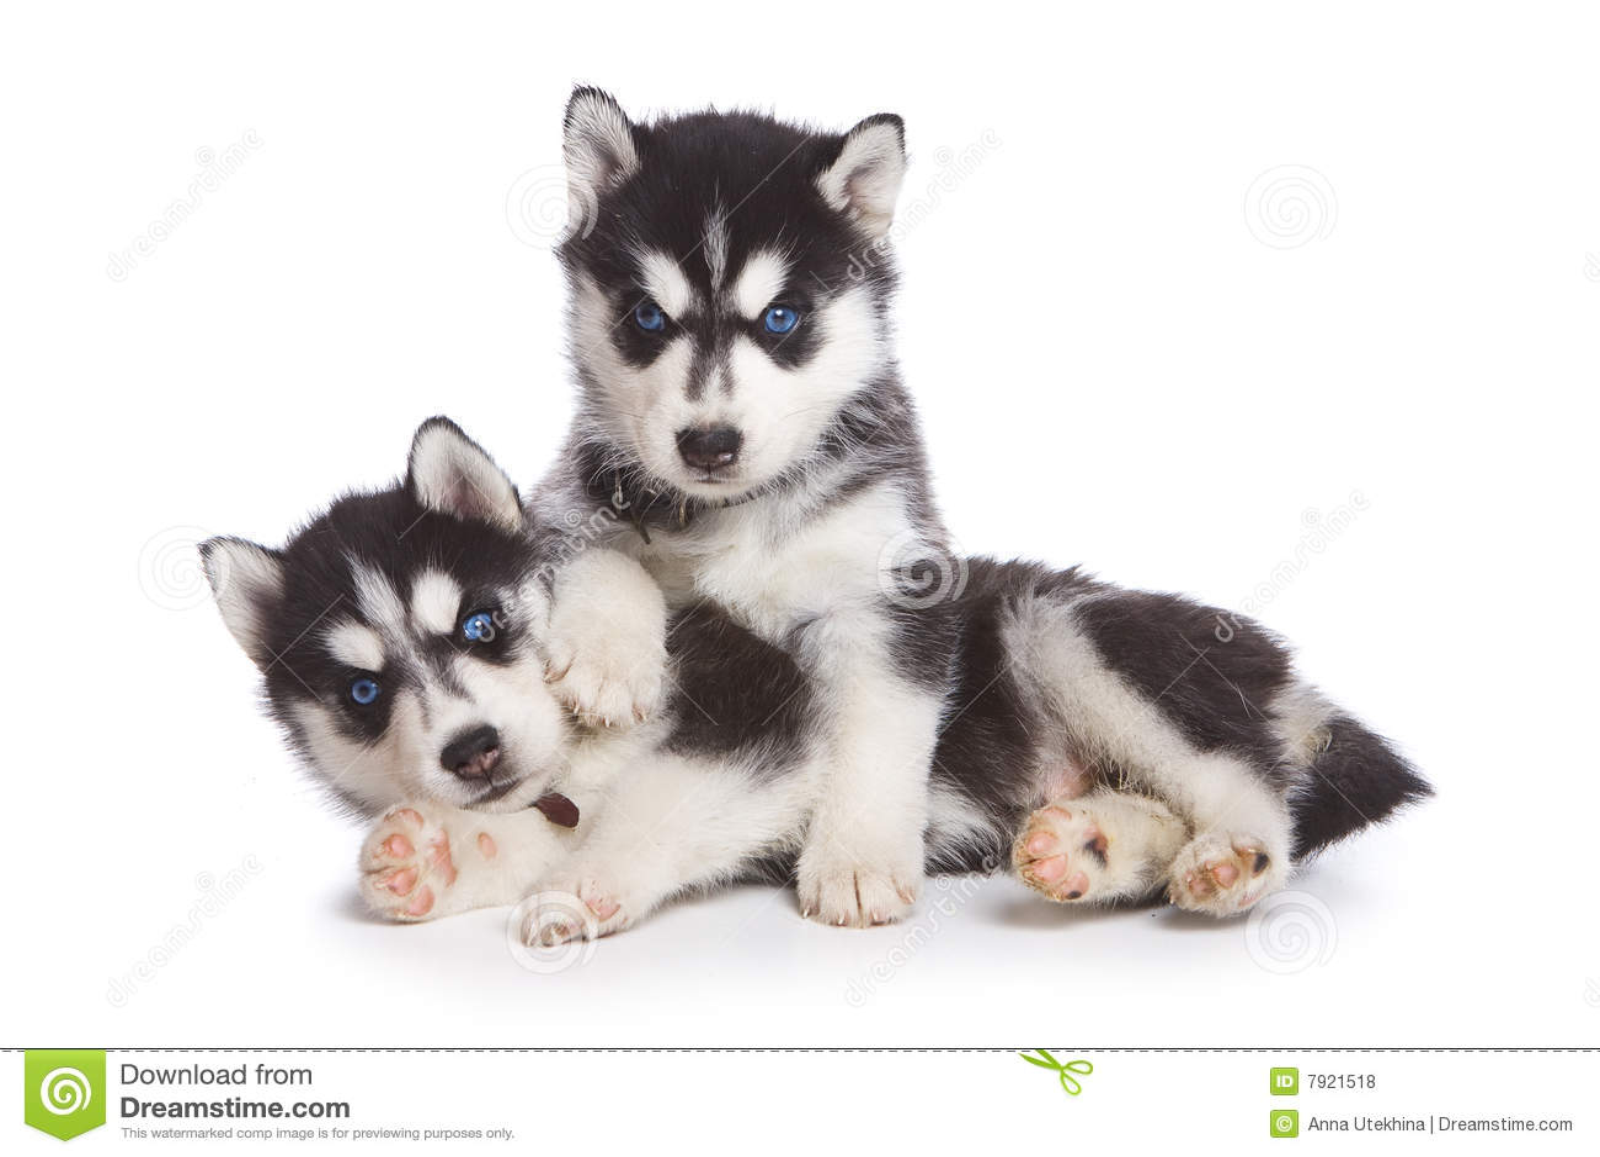 free clipart husky dog - photo #38